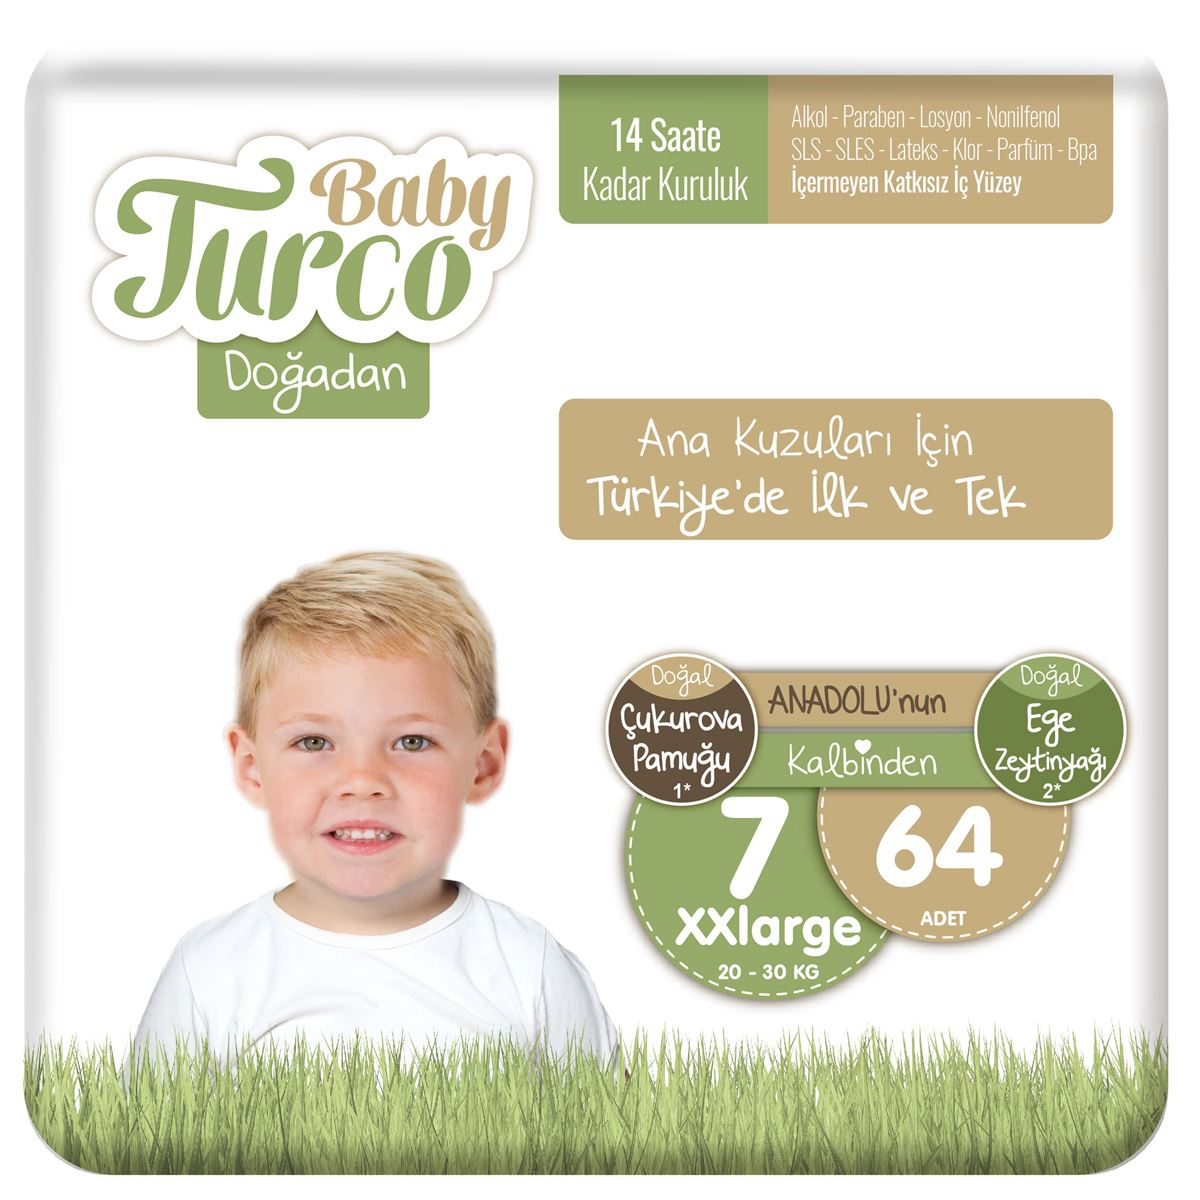 Baby Turco Doğadan 7 Numara Xxlarge 64 Adet